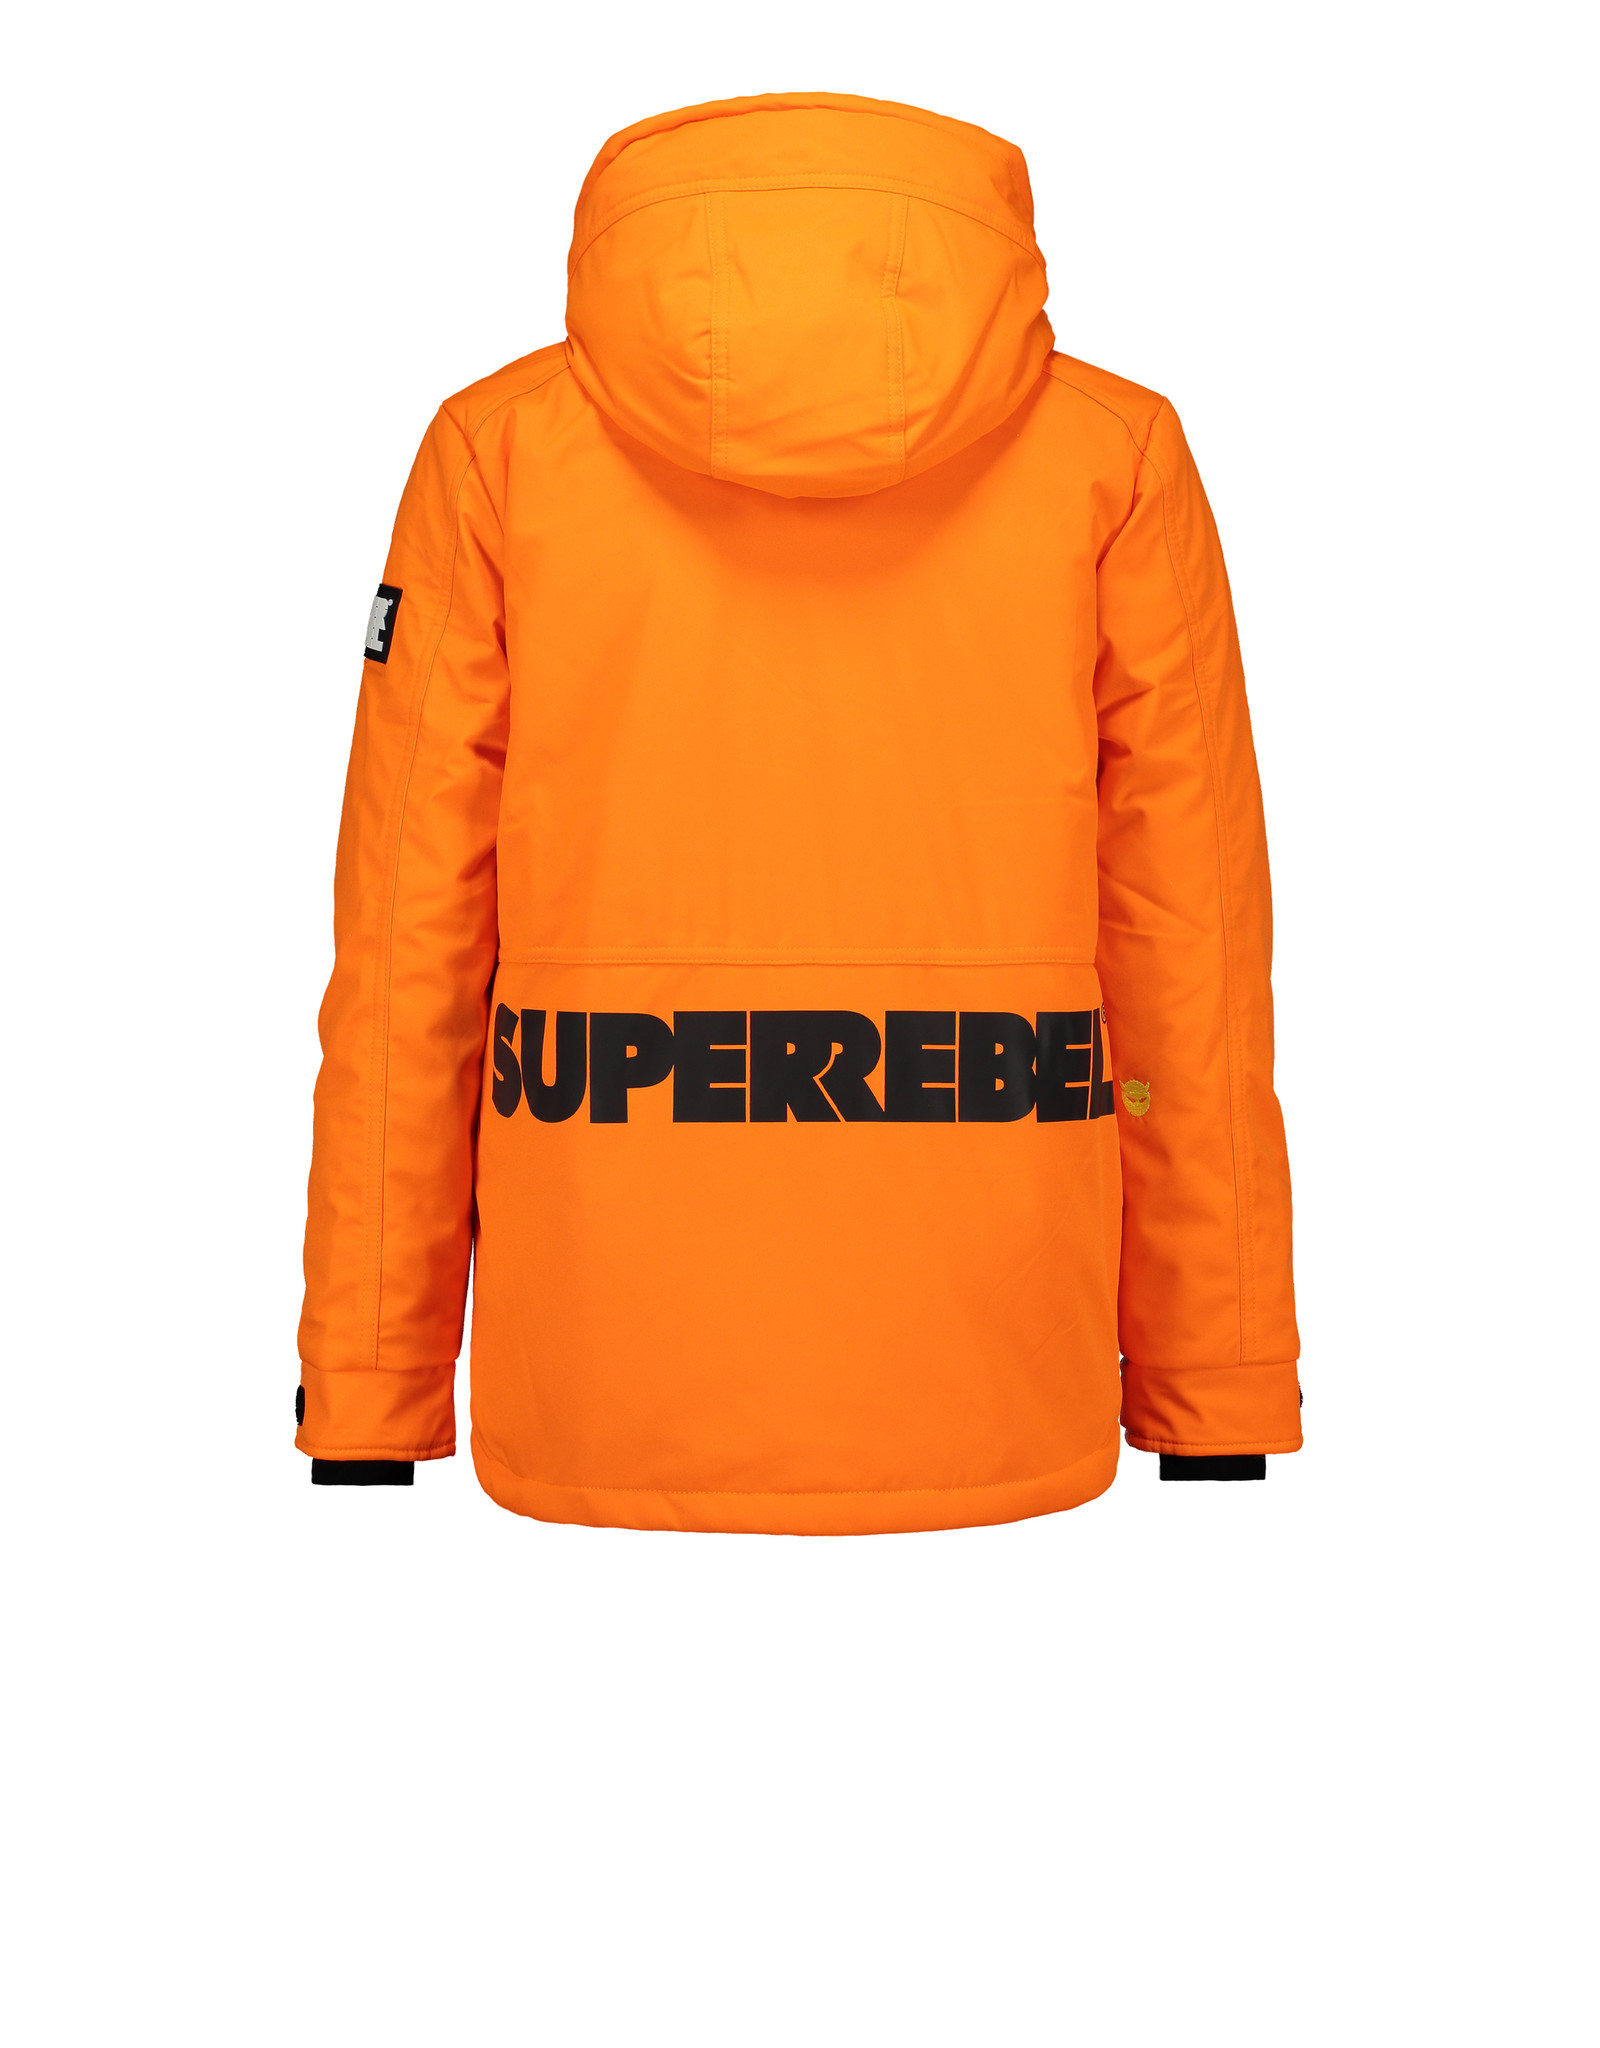 Super Rebel Super Rebel Ski Technical Jacket Plain NEON ORANGE